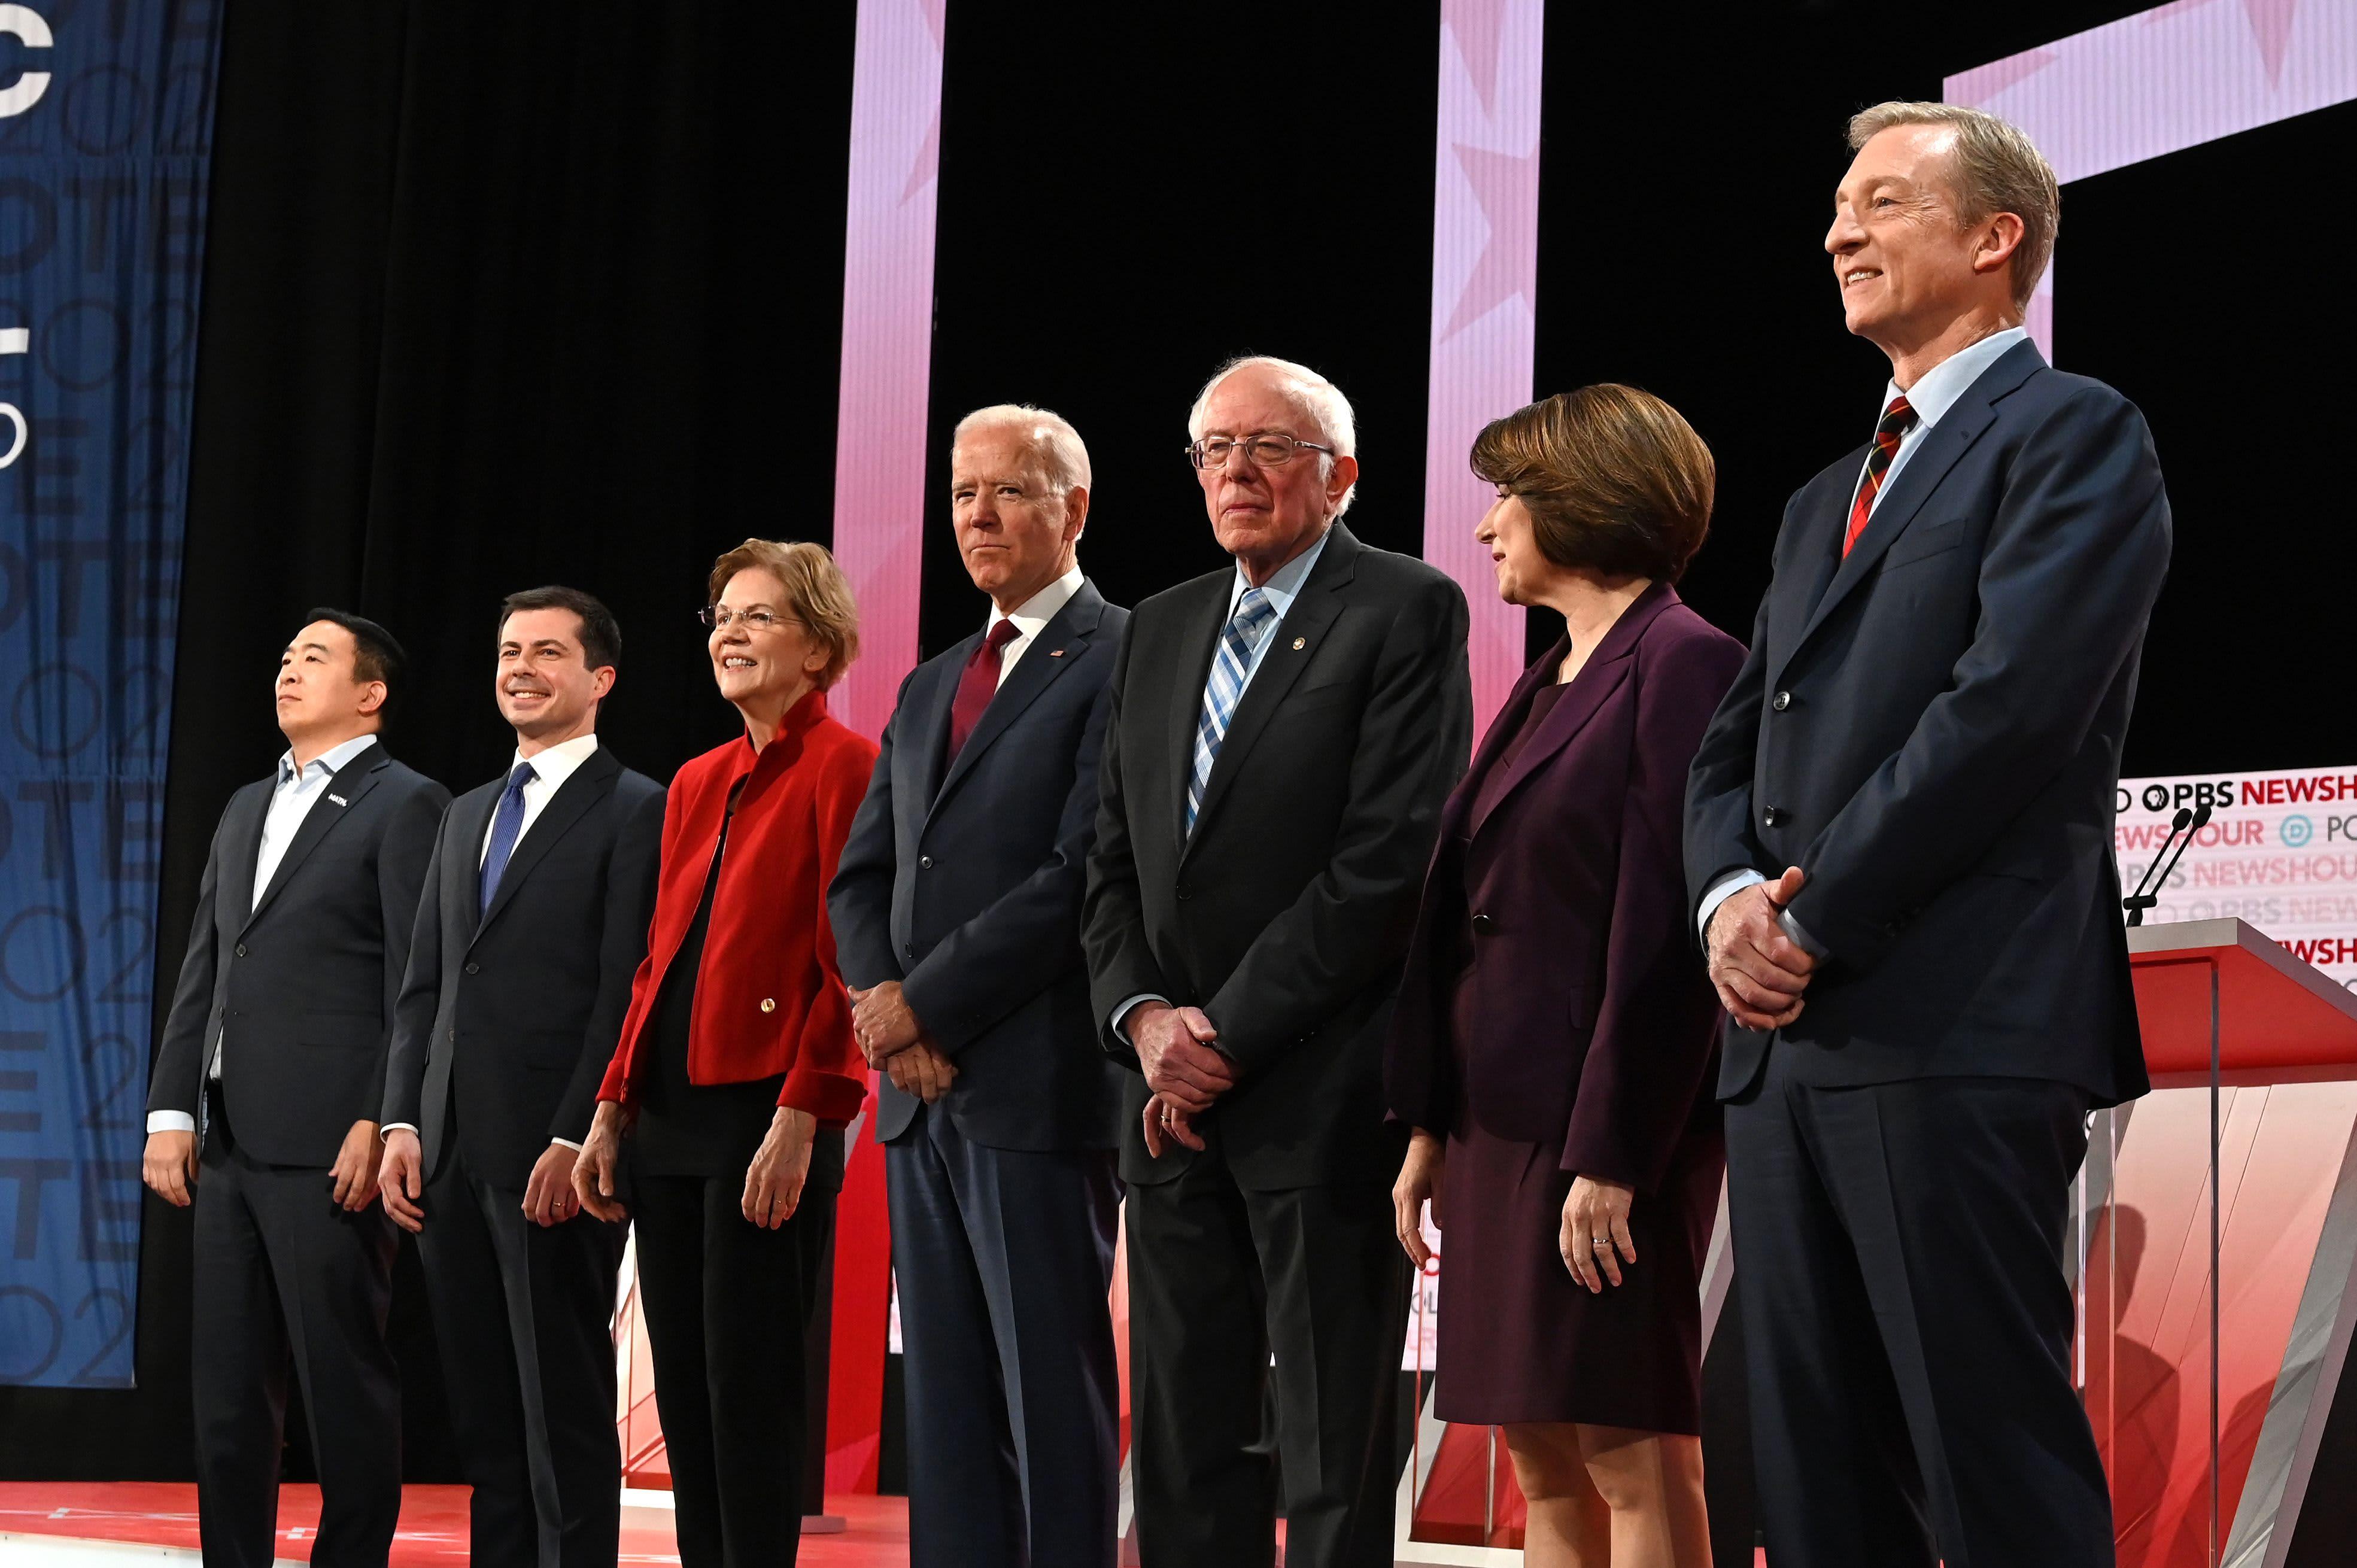 2020 Democrats sound off on Trump impeachment